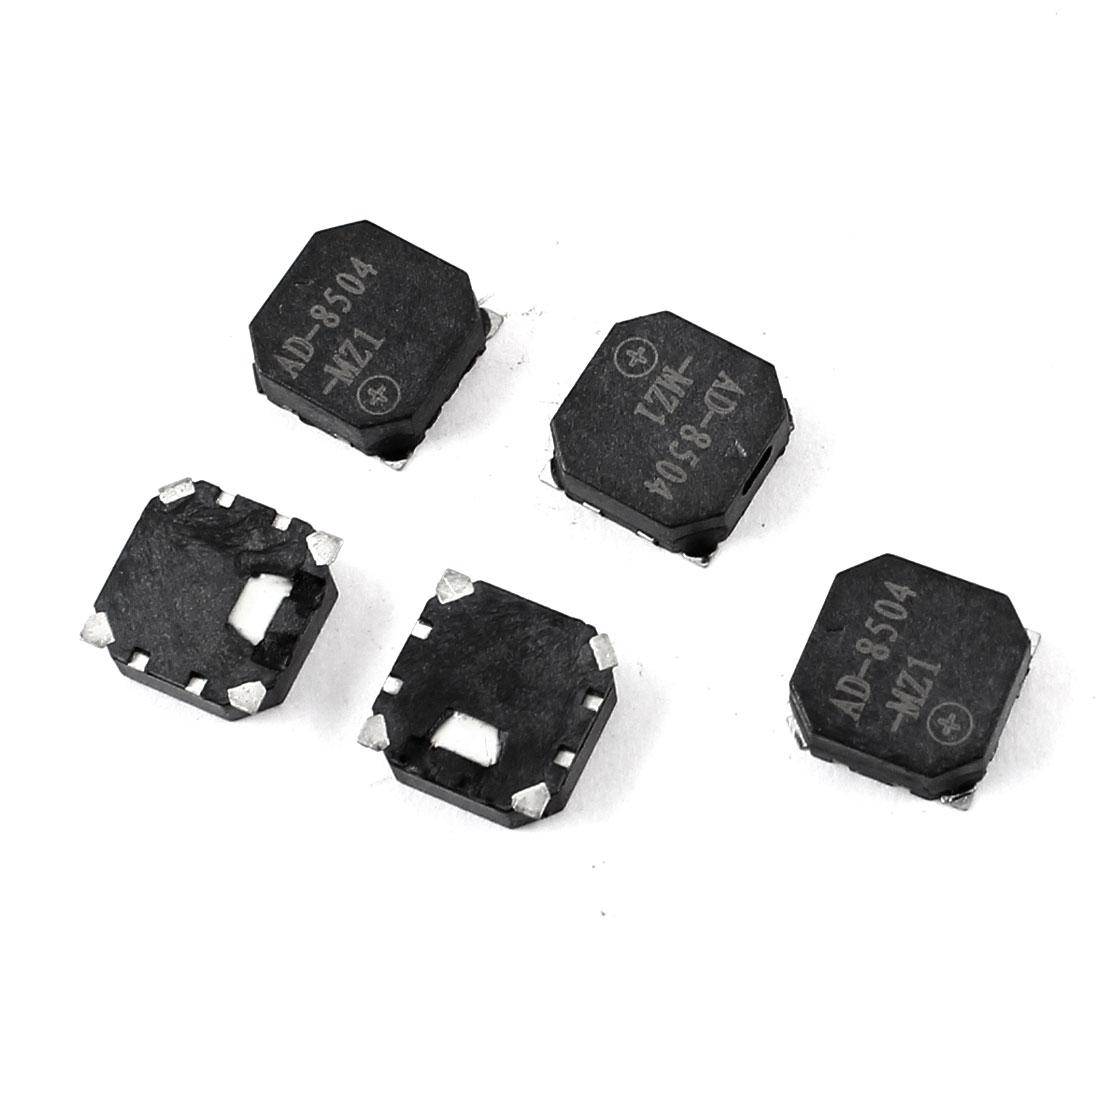 5pcs 8.5mm x 8.5mm x 3mm Square Shape SMD Passive Buzzer Black DC 3.6V 90mA